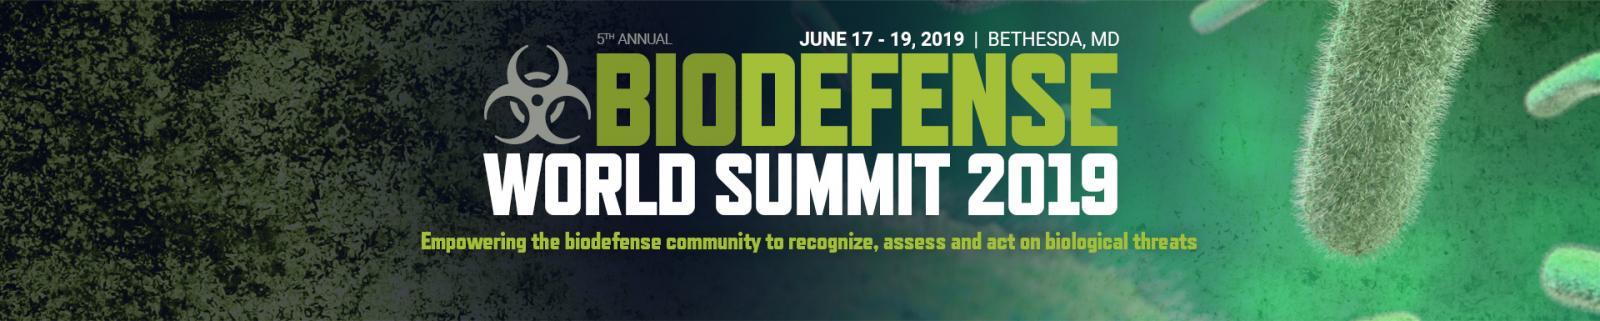 5th Annual Biodefense World Summit